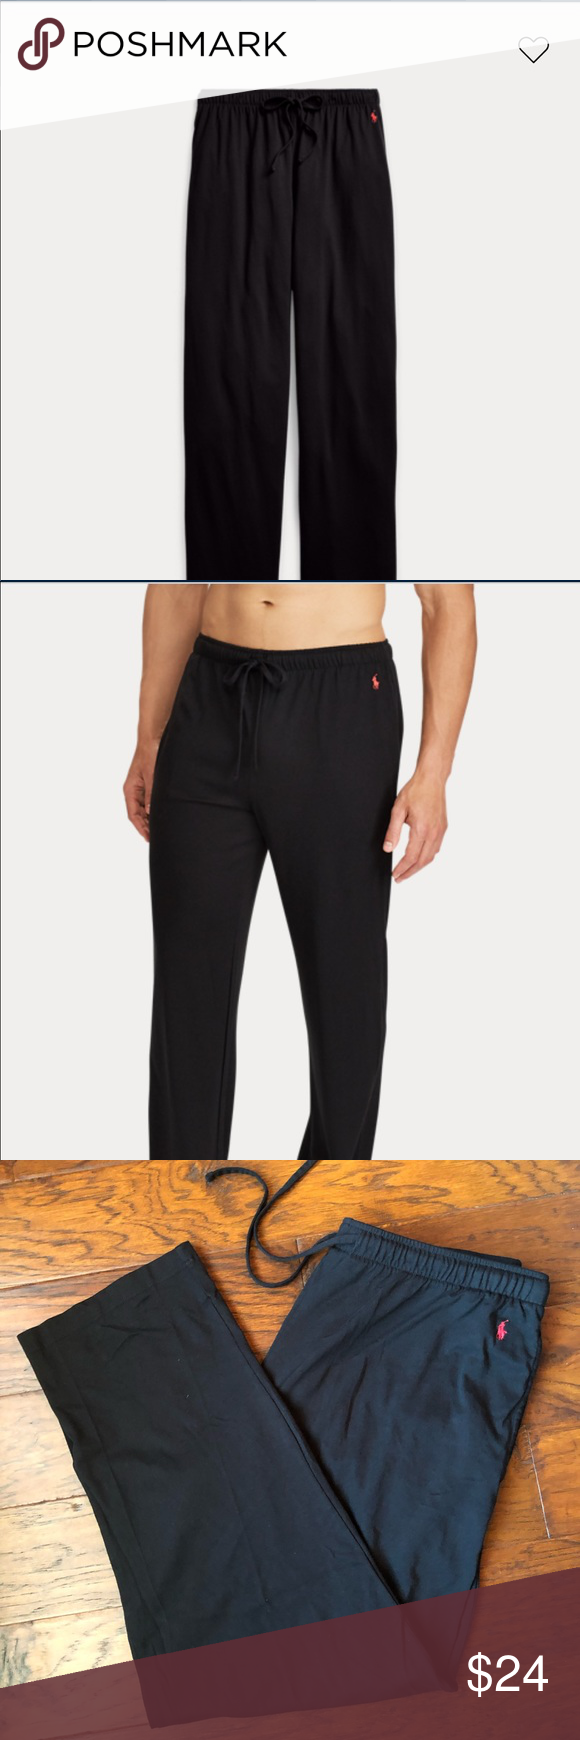 Men S Ralph Lauren Lounge Pant Great Condition Part Of Our Supreme